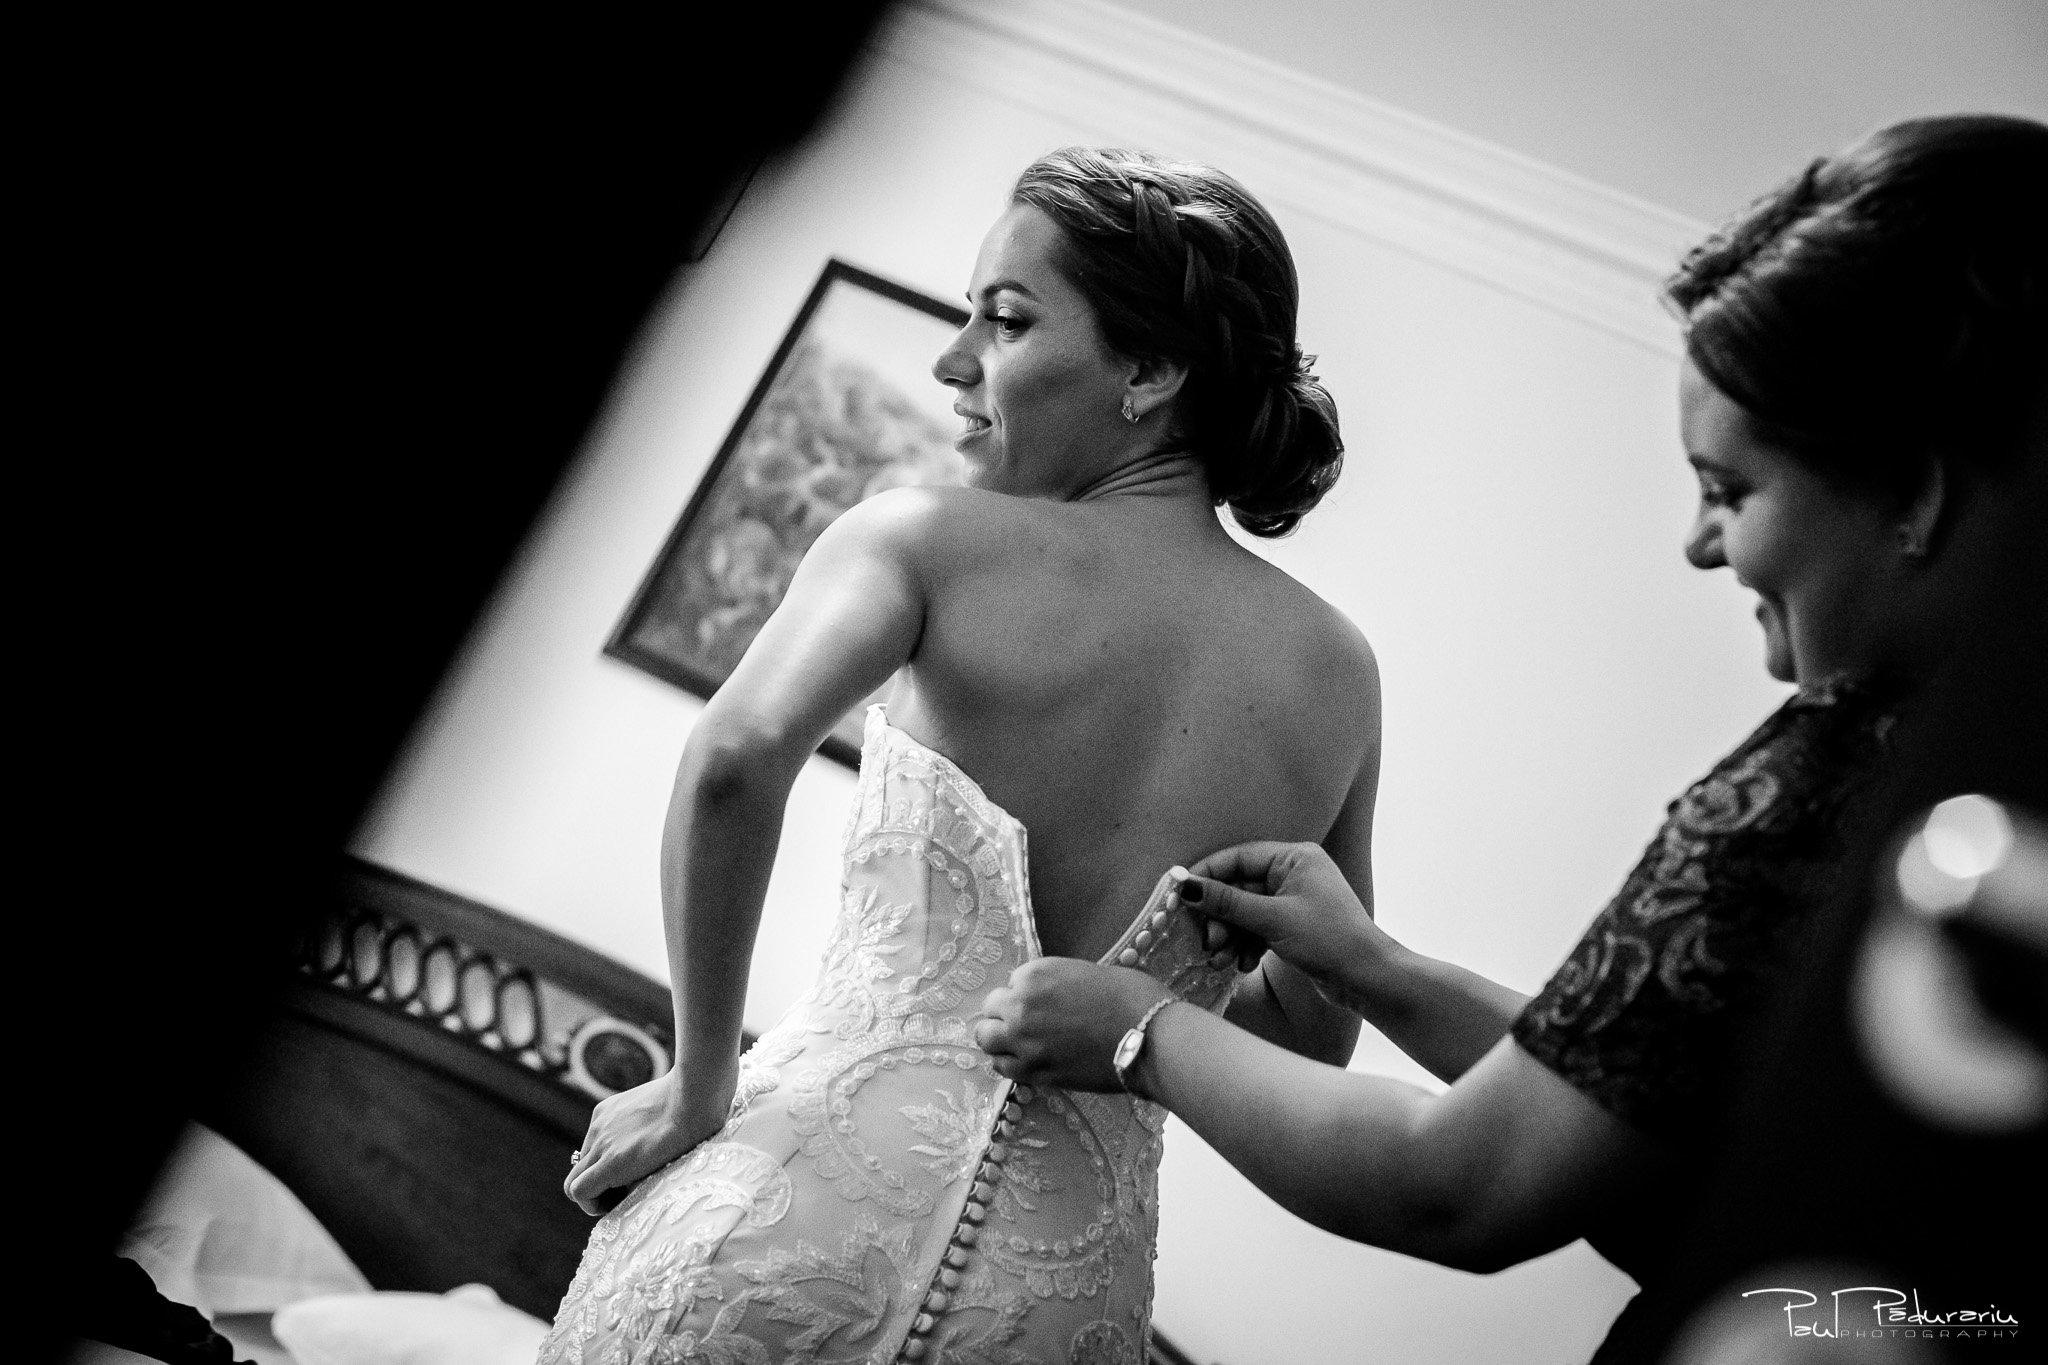 Roxana si Silviu Nunta Hotel Eden Iasi - pregatiri imbracatul miresei - fotograf profesionist nunta www.paulpadurariu.ro © 2017 Paul Padurariu